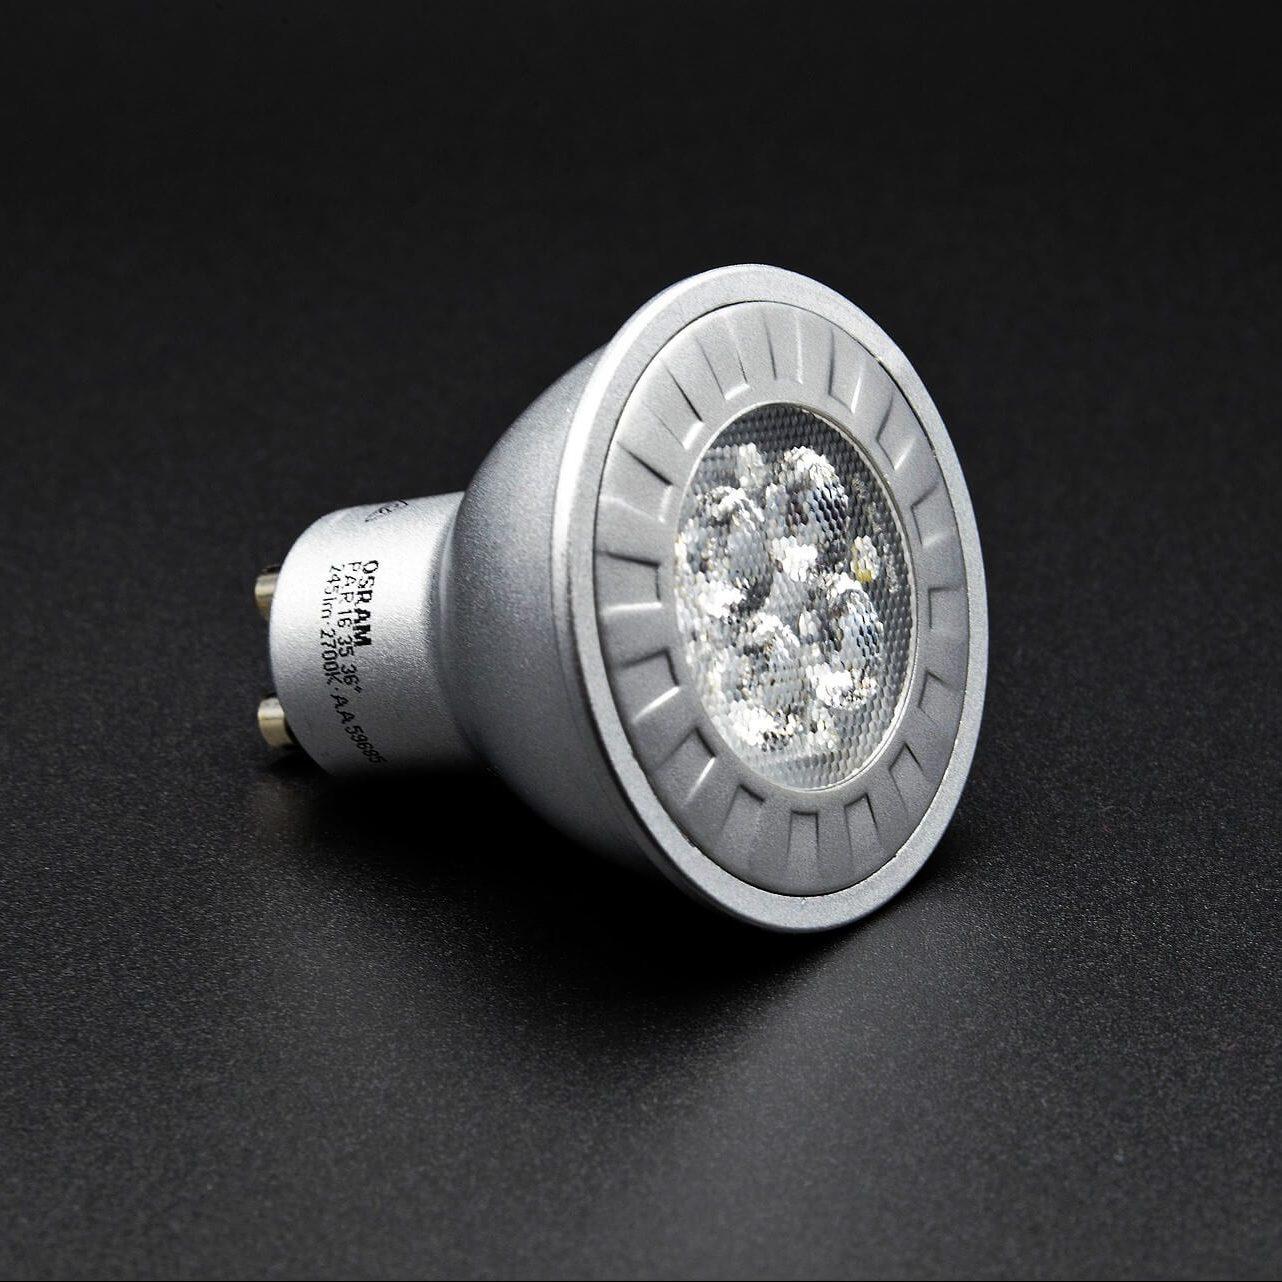 LEDが光合成を促す理由は?メリット・デメリットと導入時のポイント